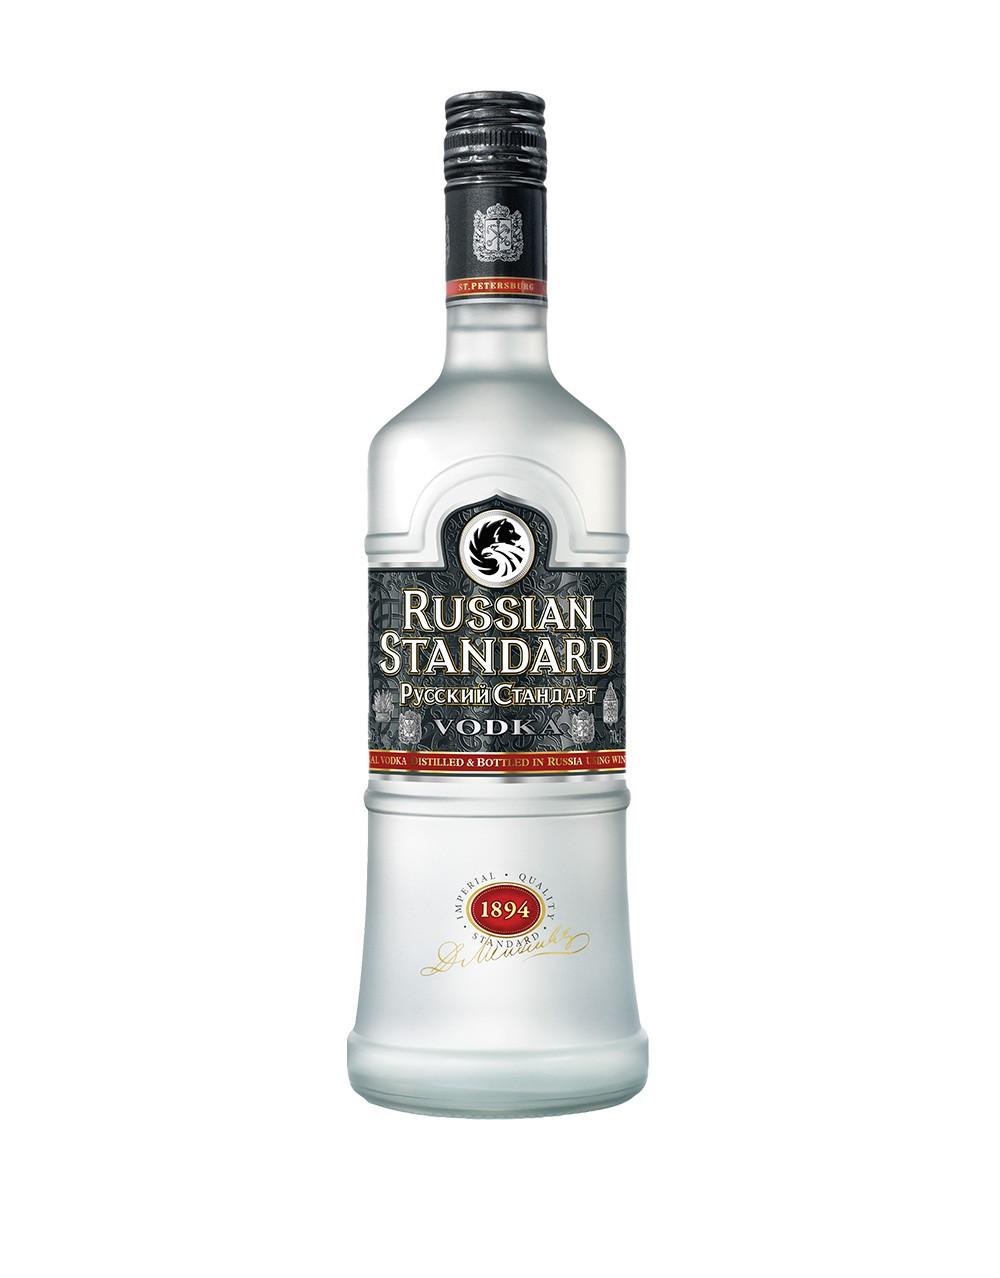 Russian Standard Original  Buy Online or Send as a Gift  ReserveBar